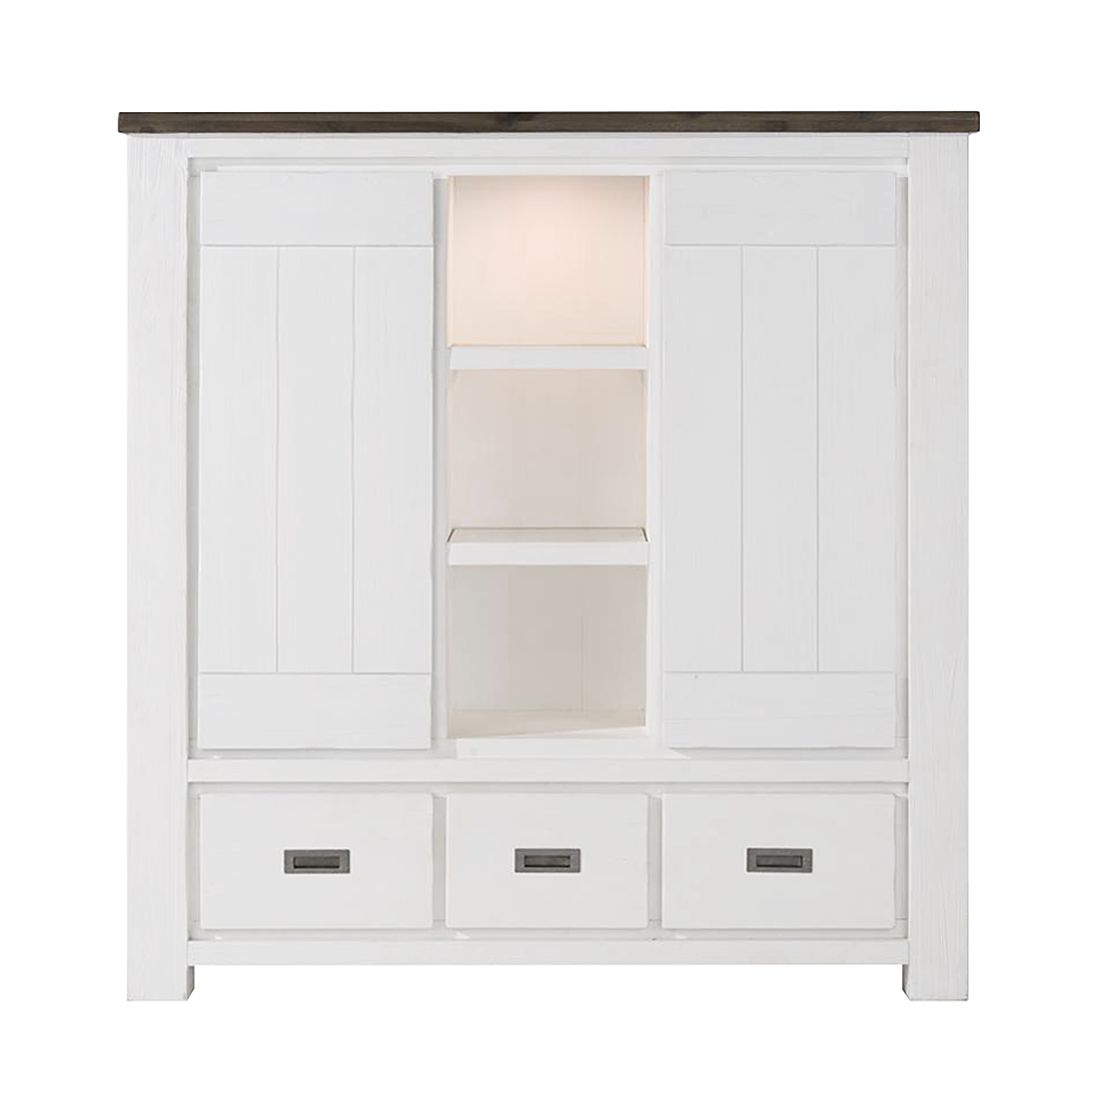 EEK A+, Highboard Deaumain - inklusive Beleuchtung - Akazie teilmassiv - Weiß, Habufa